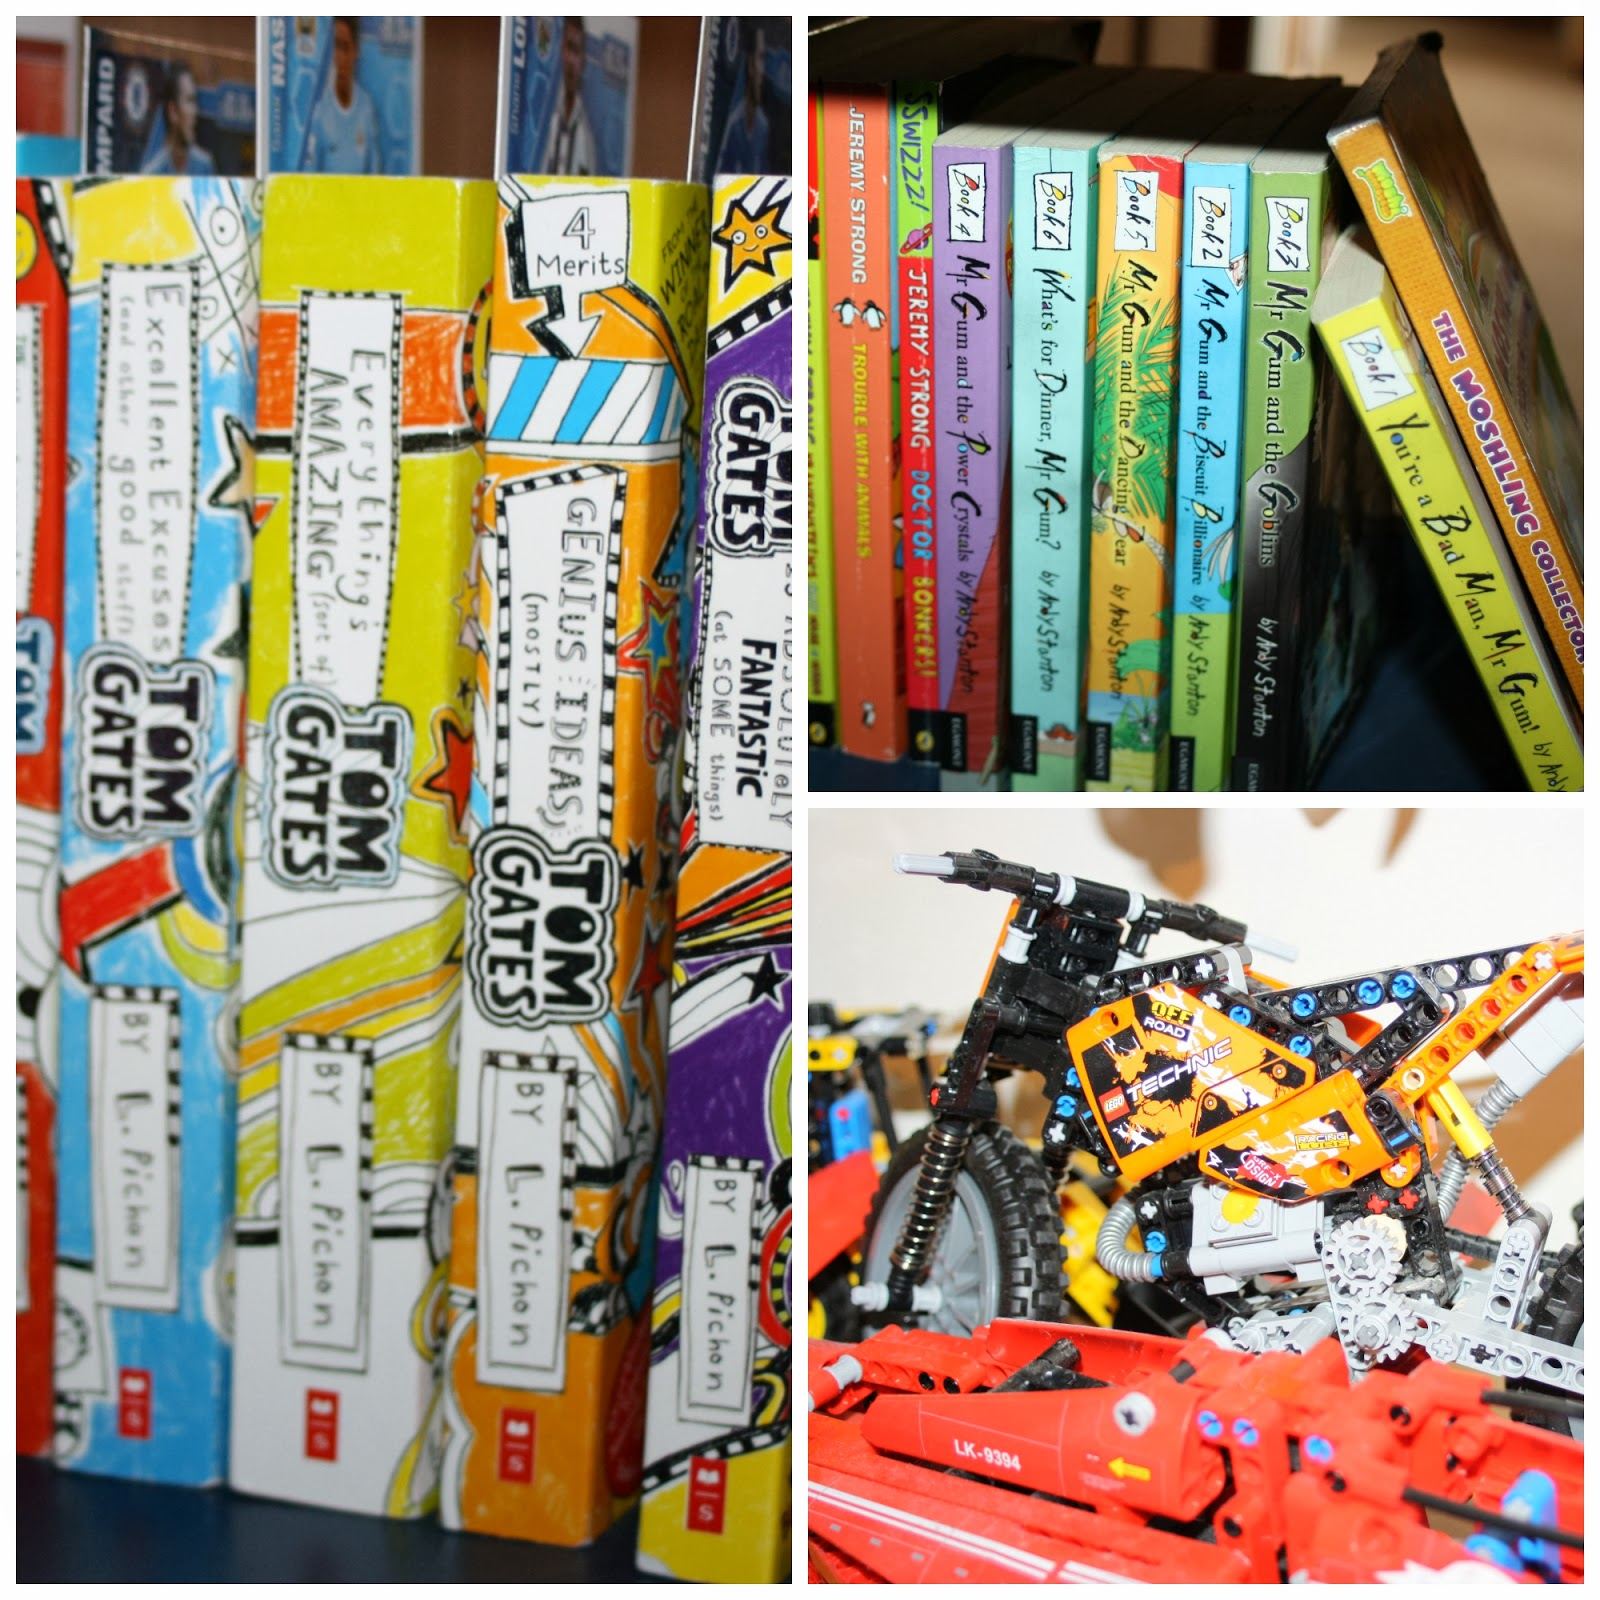 Bedroom-books-Lego-son-new-house